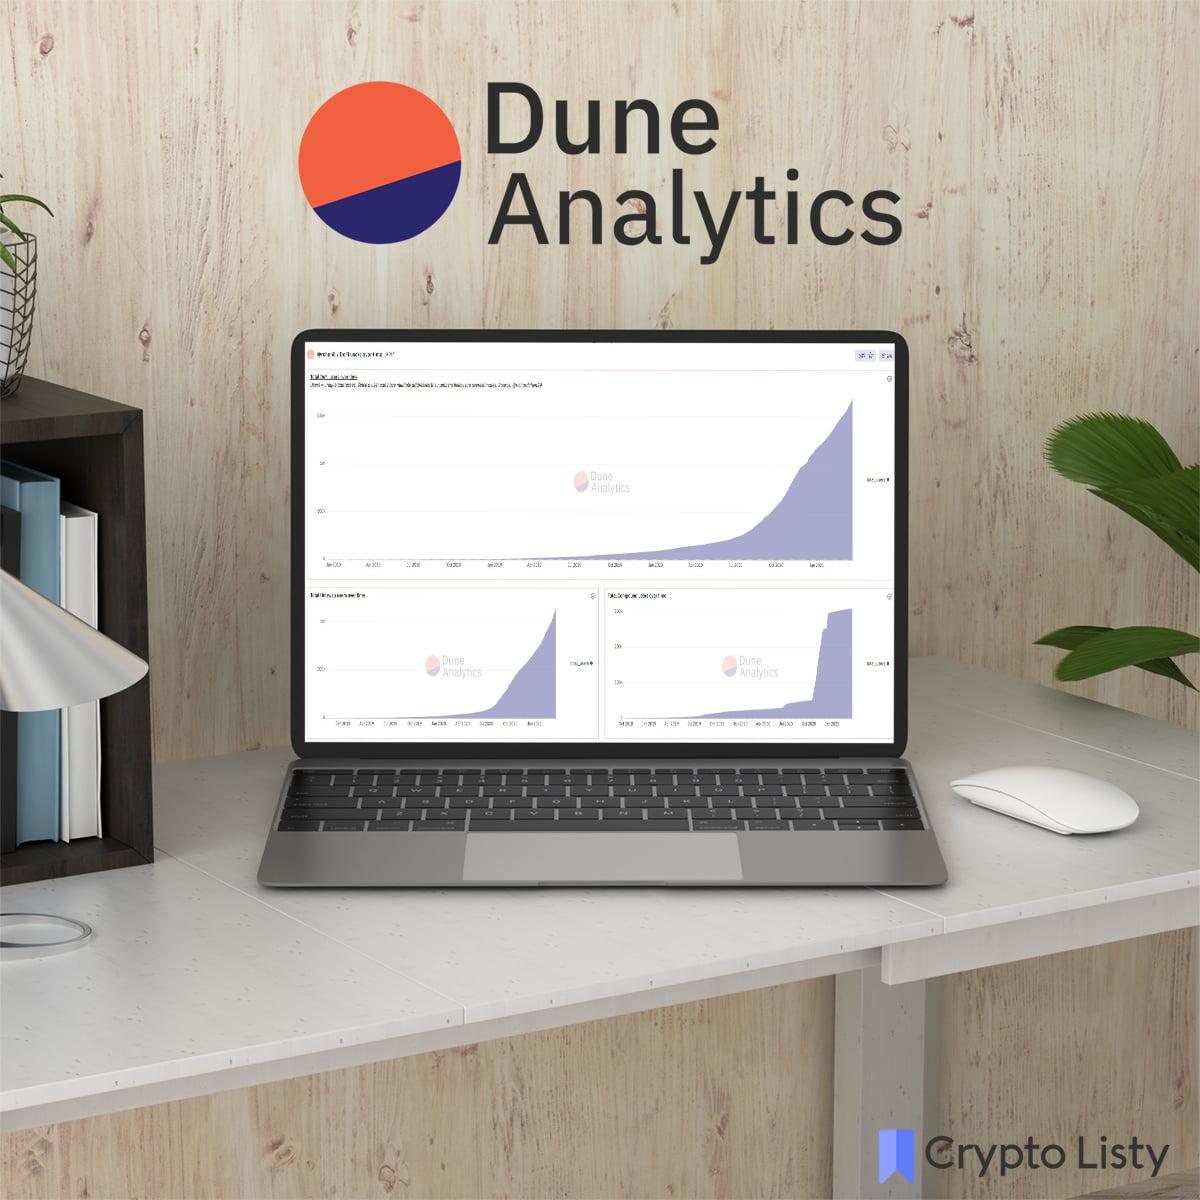 Dune Analytics website